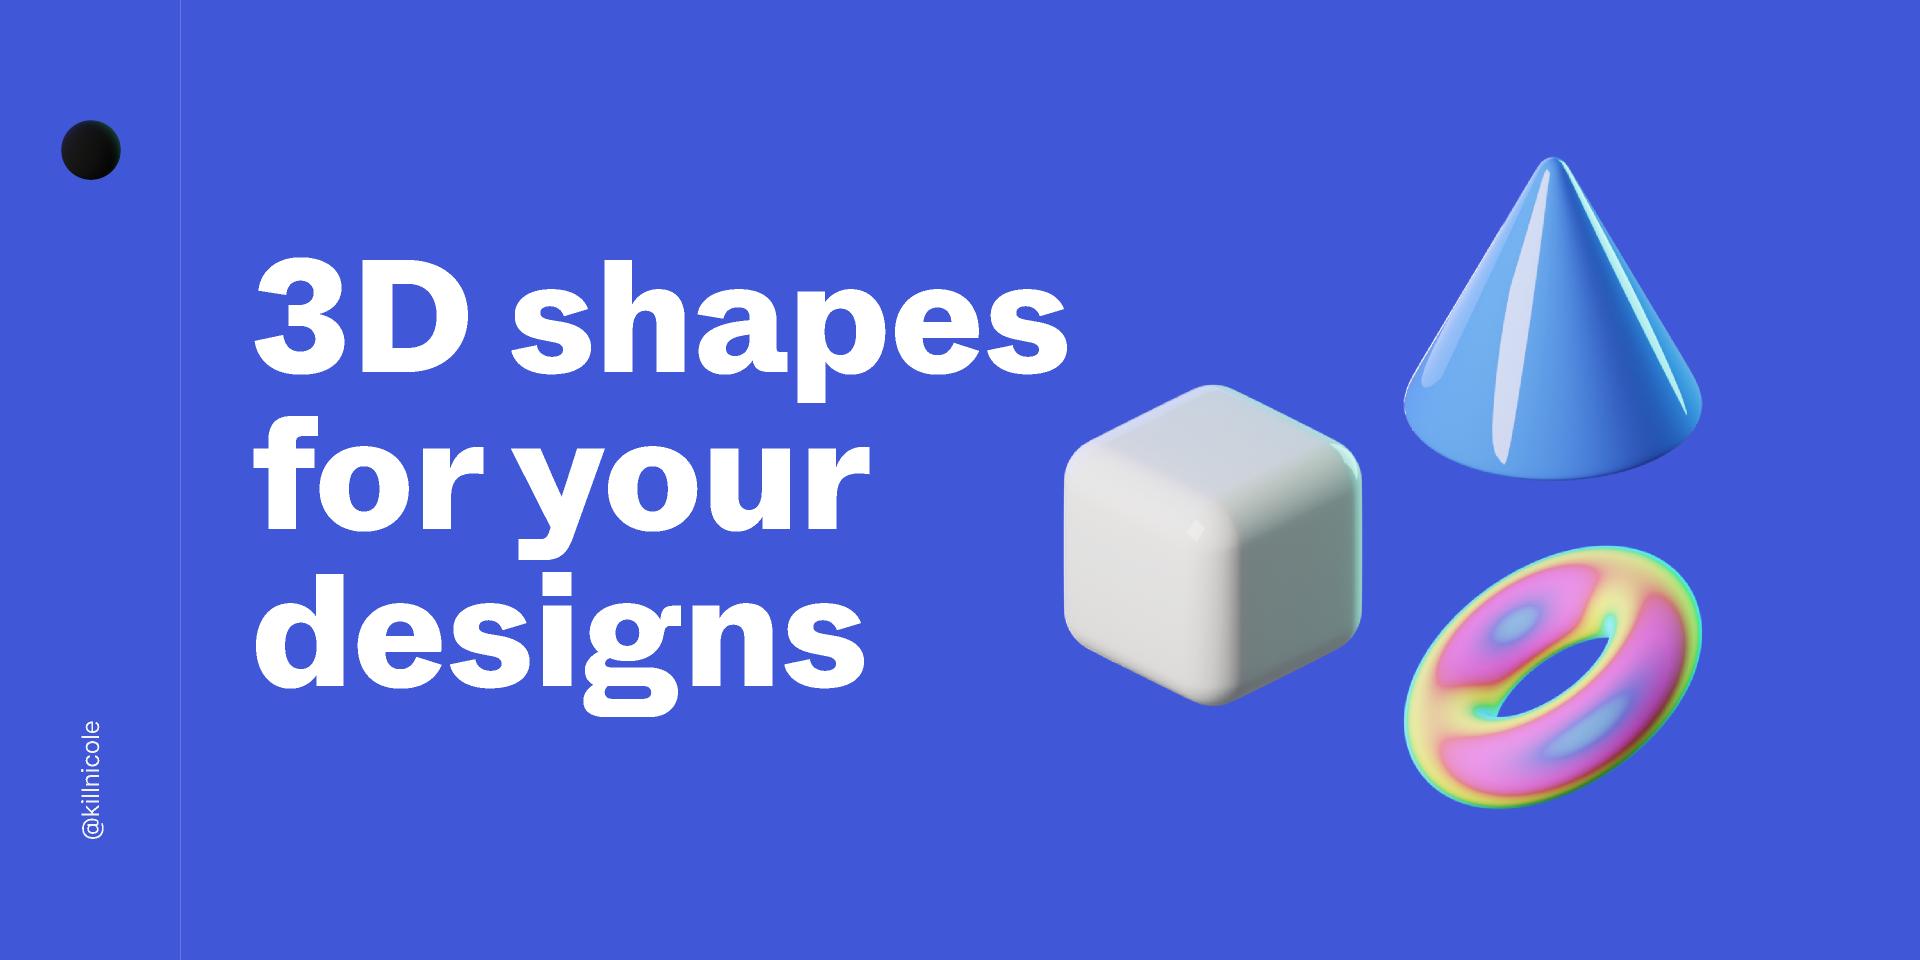 Figma 3D shapes